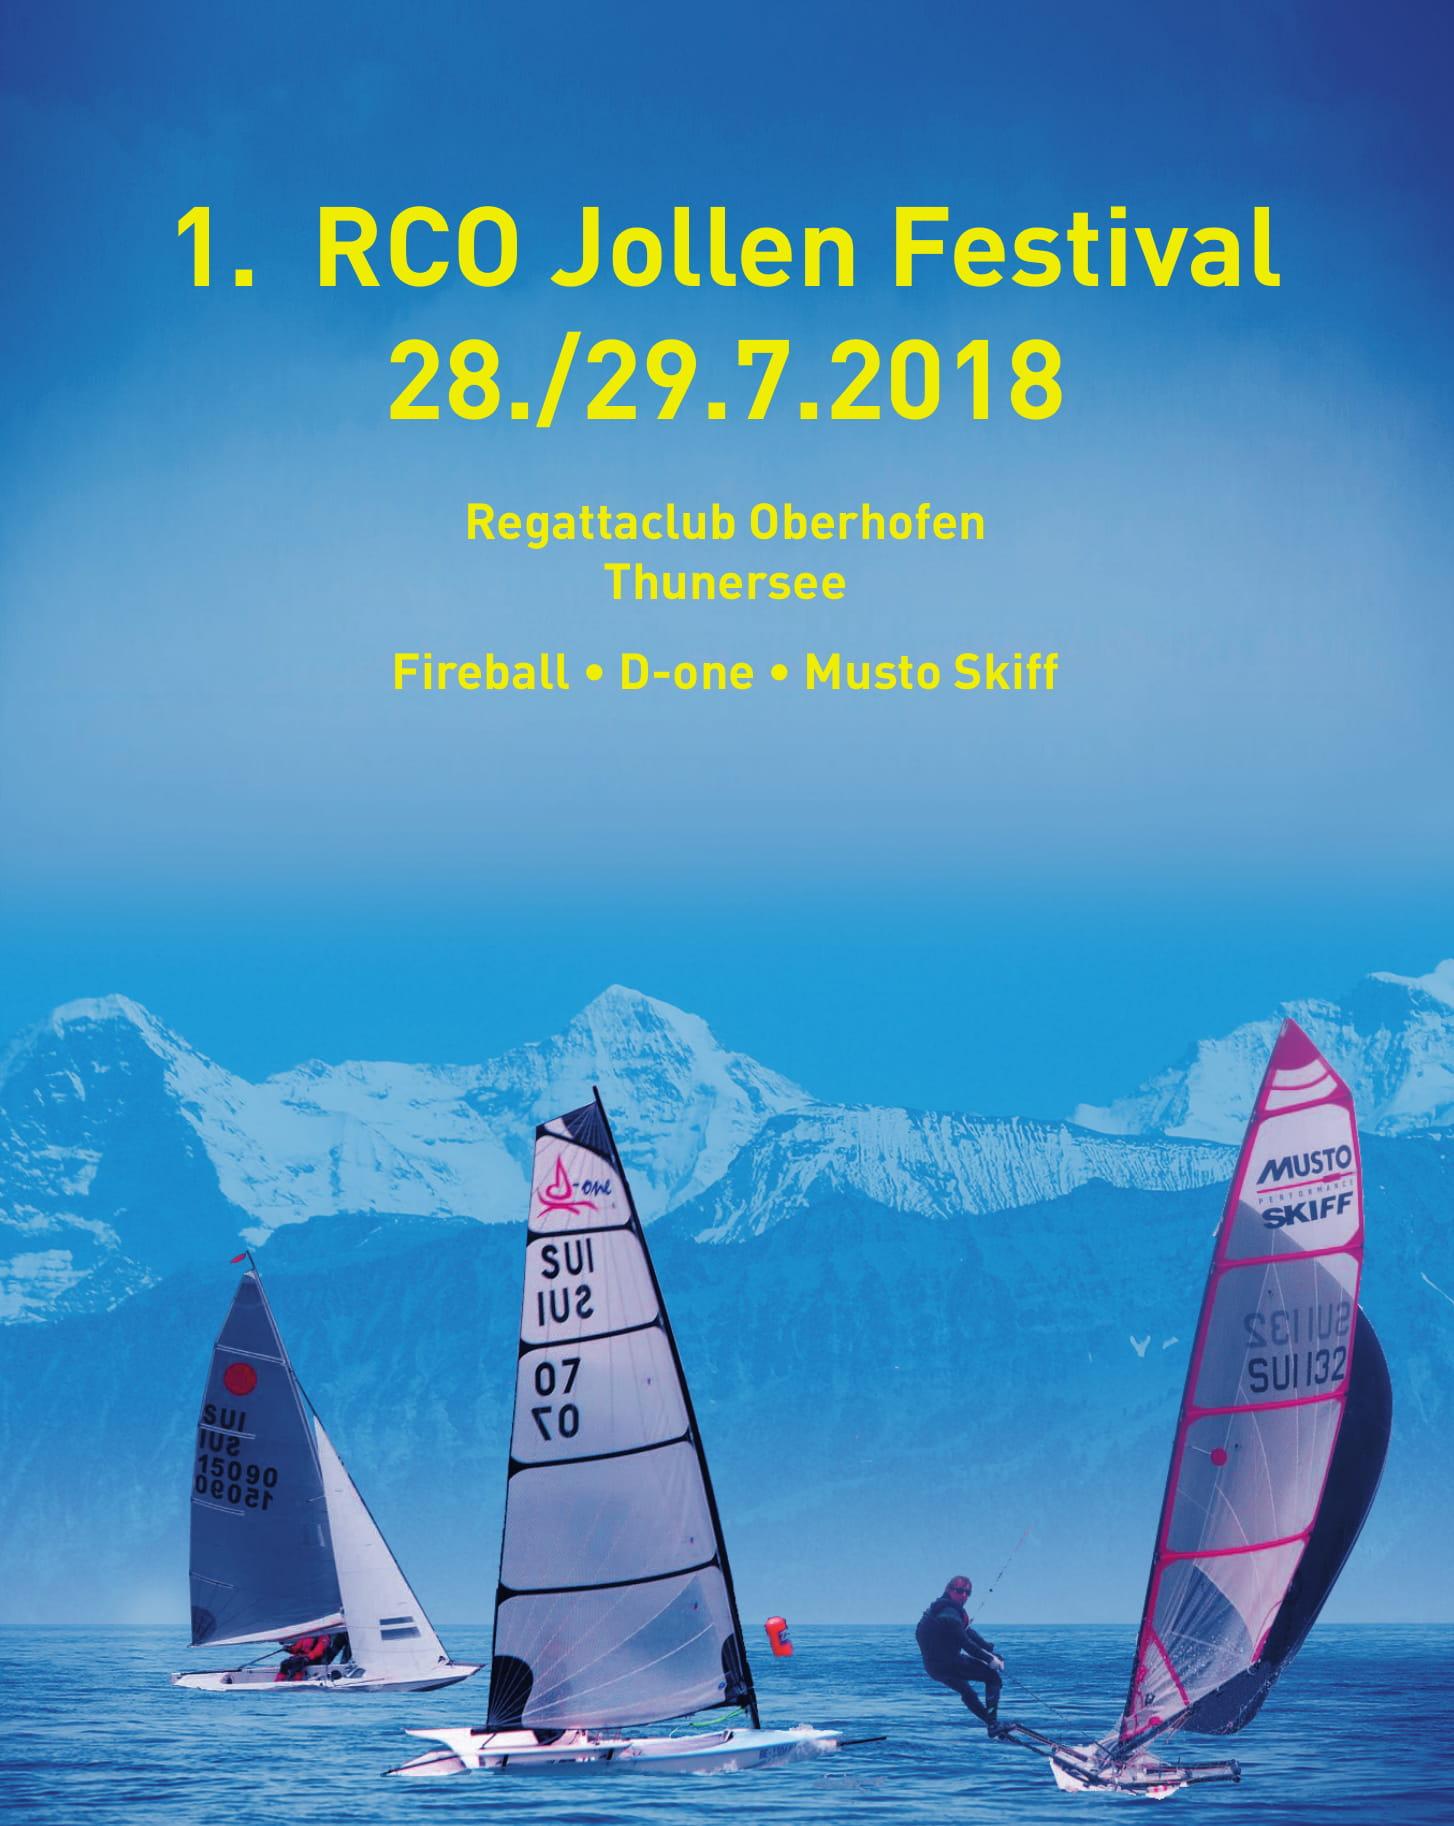 Jollenfestival 2018 1